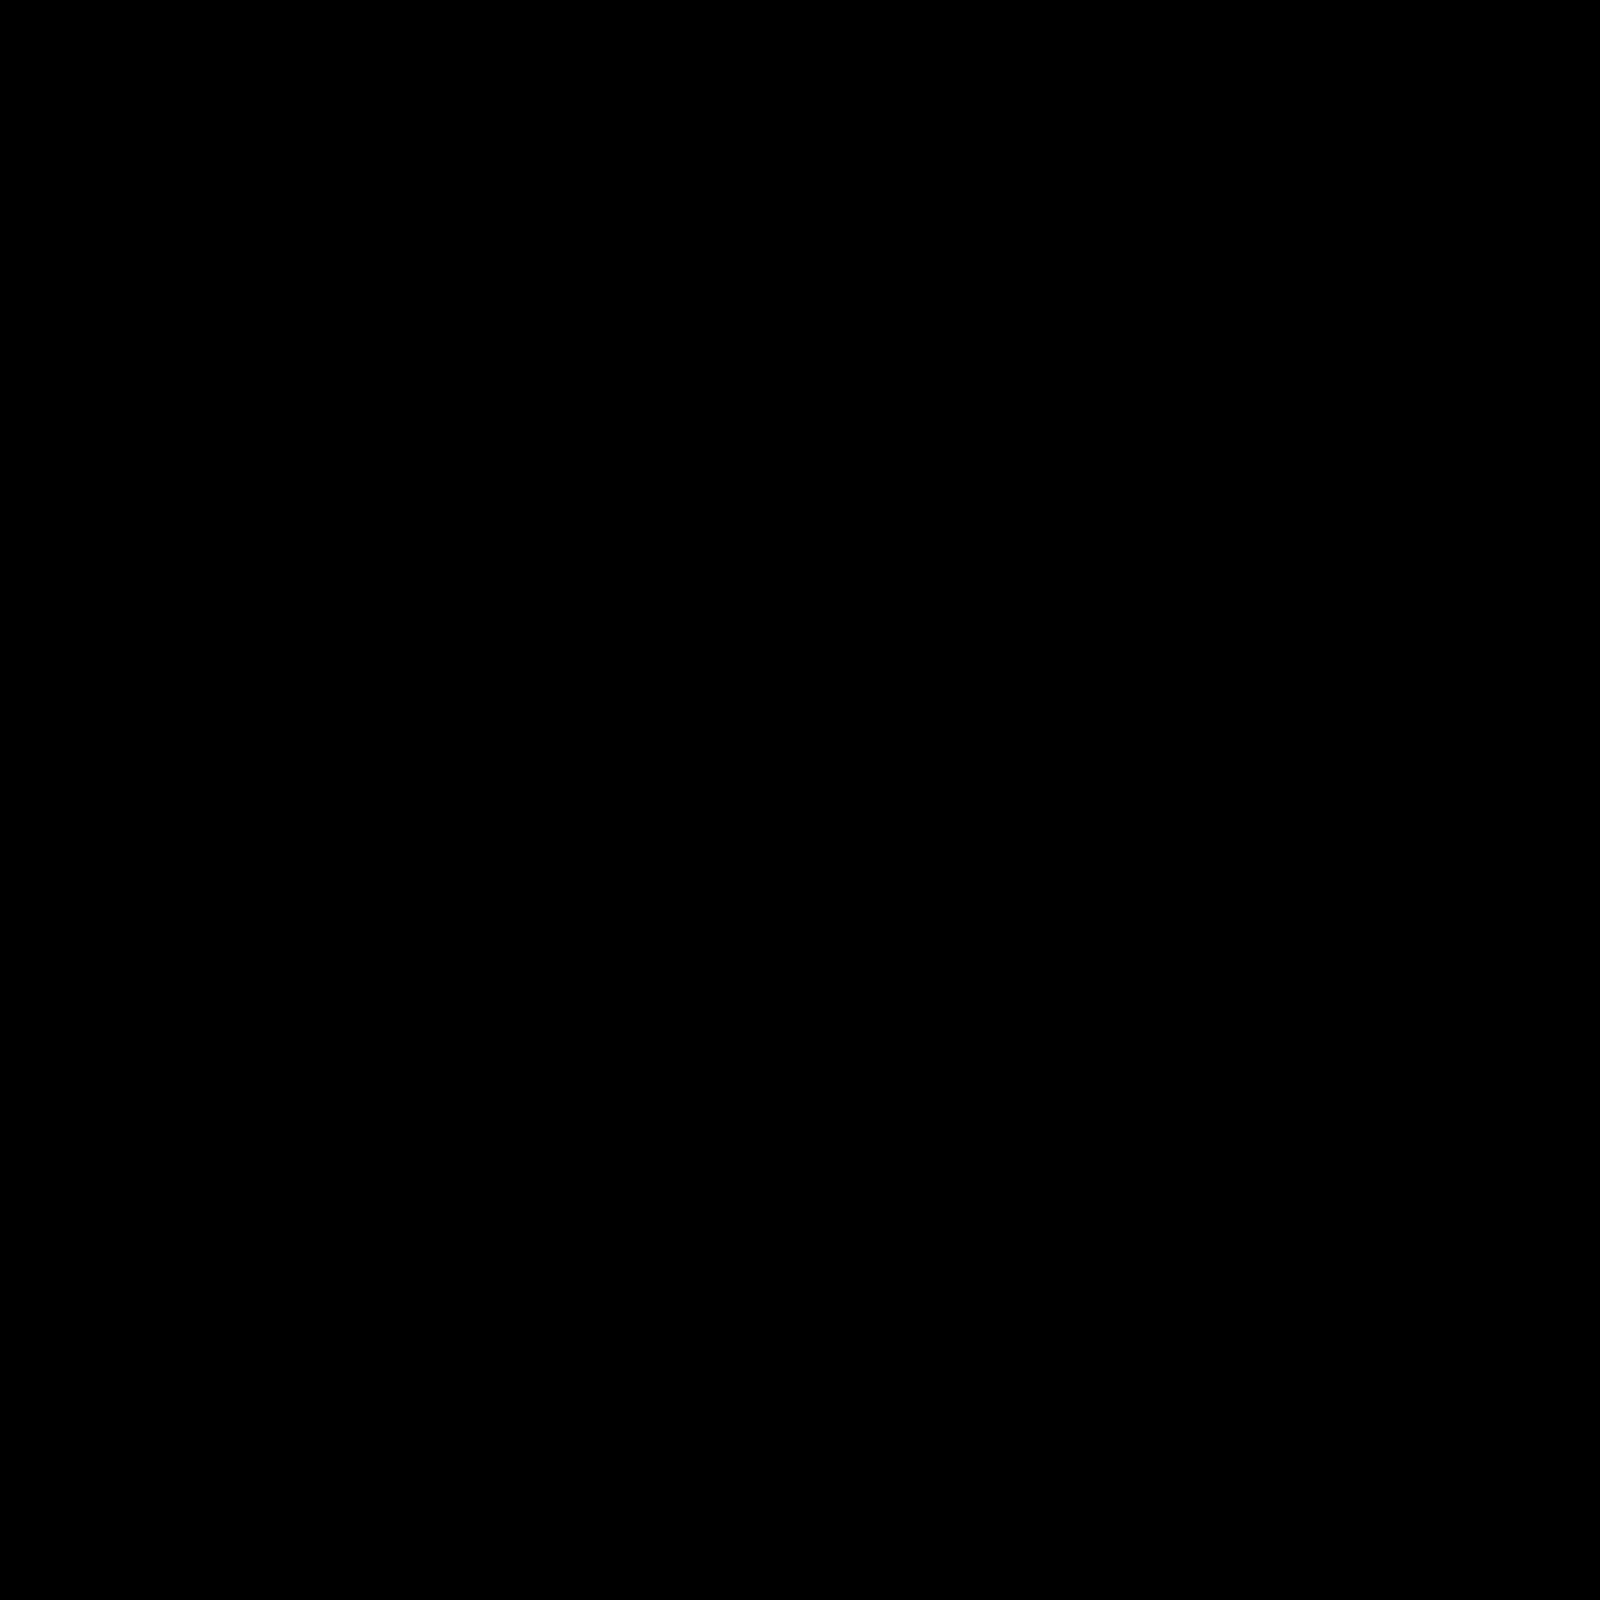 Handshake Heart Filled icon